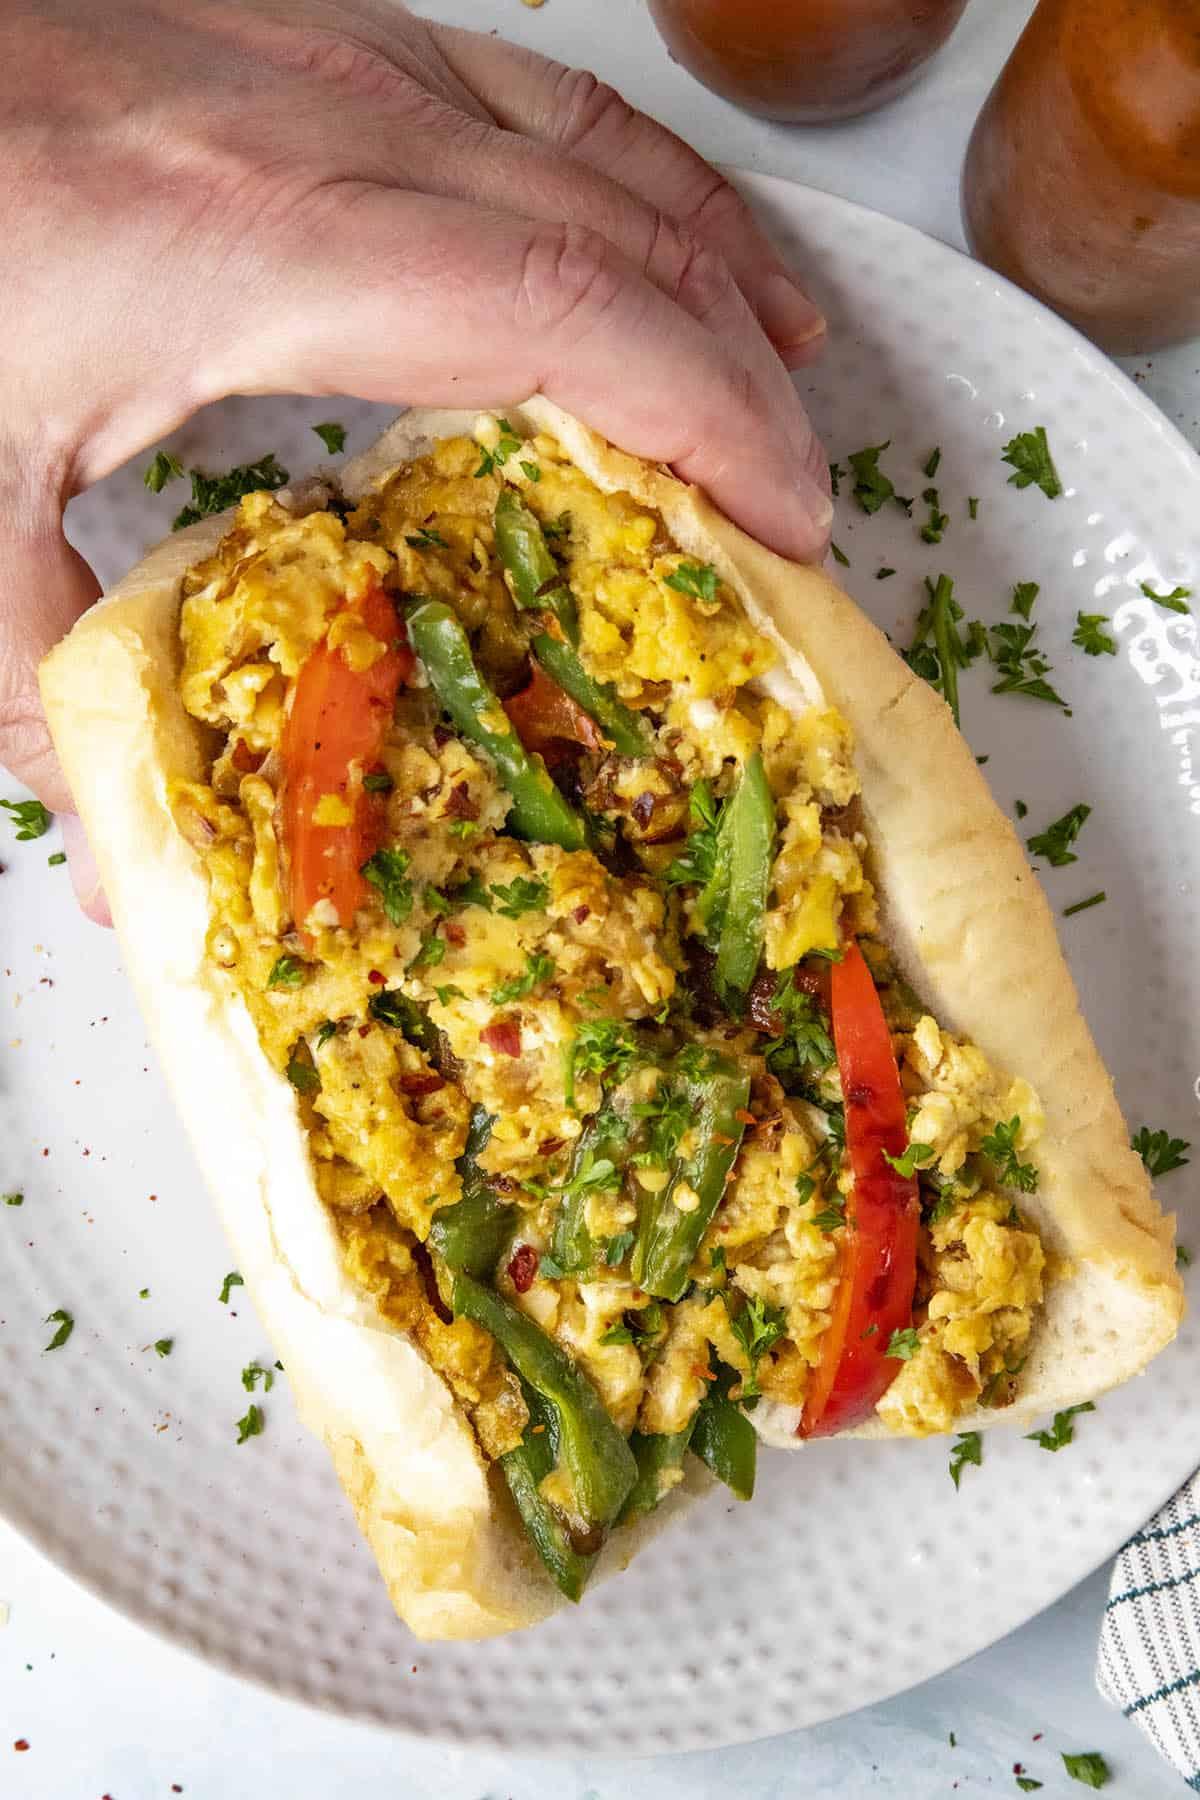 Grabbing my Pepper and Egg Sandwich